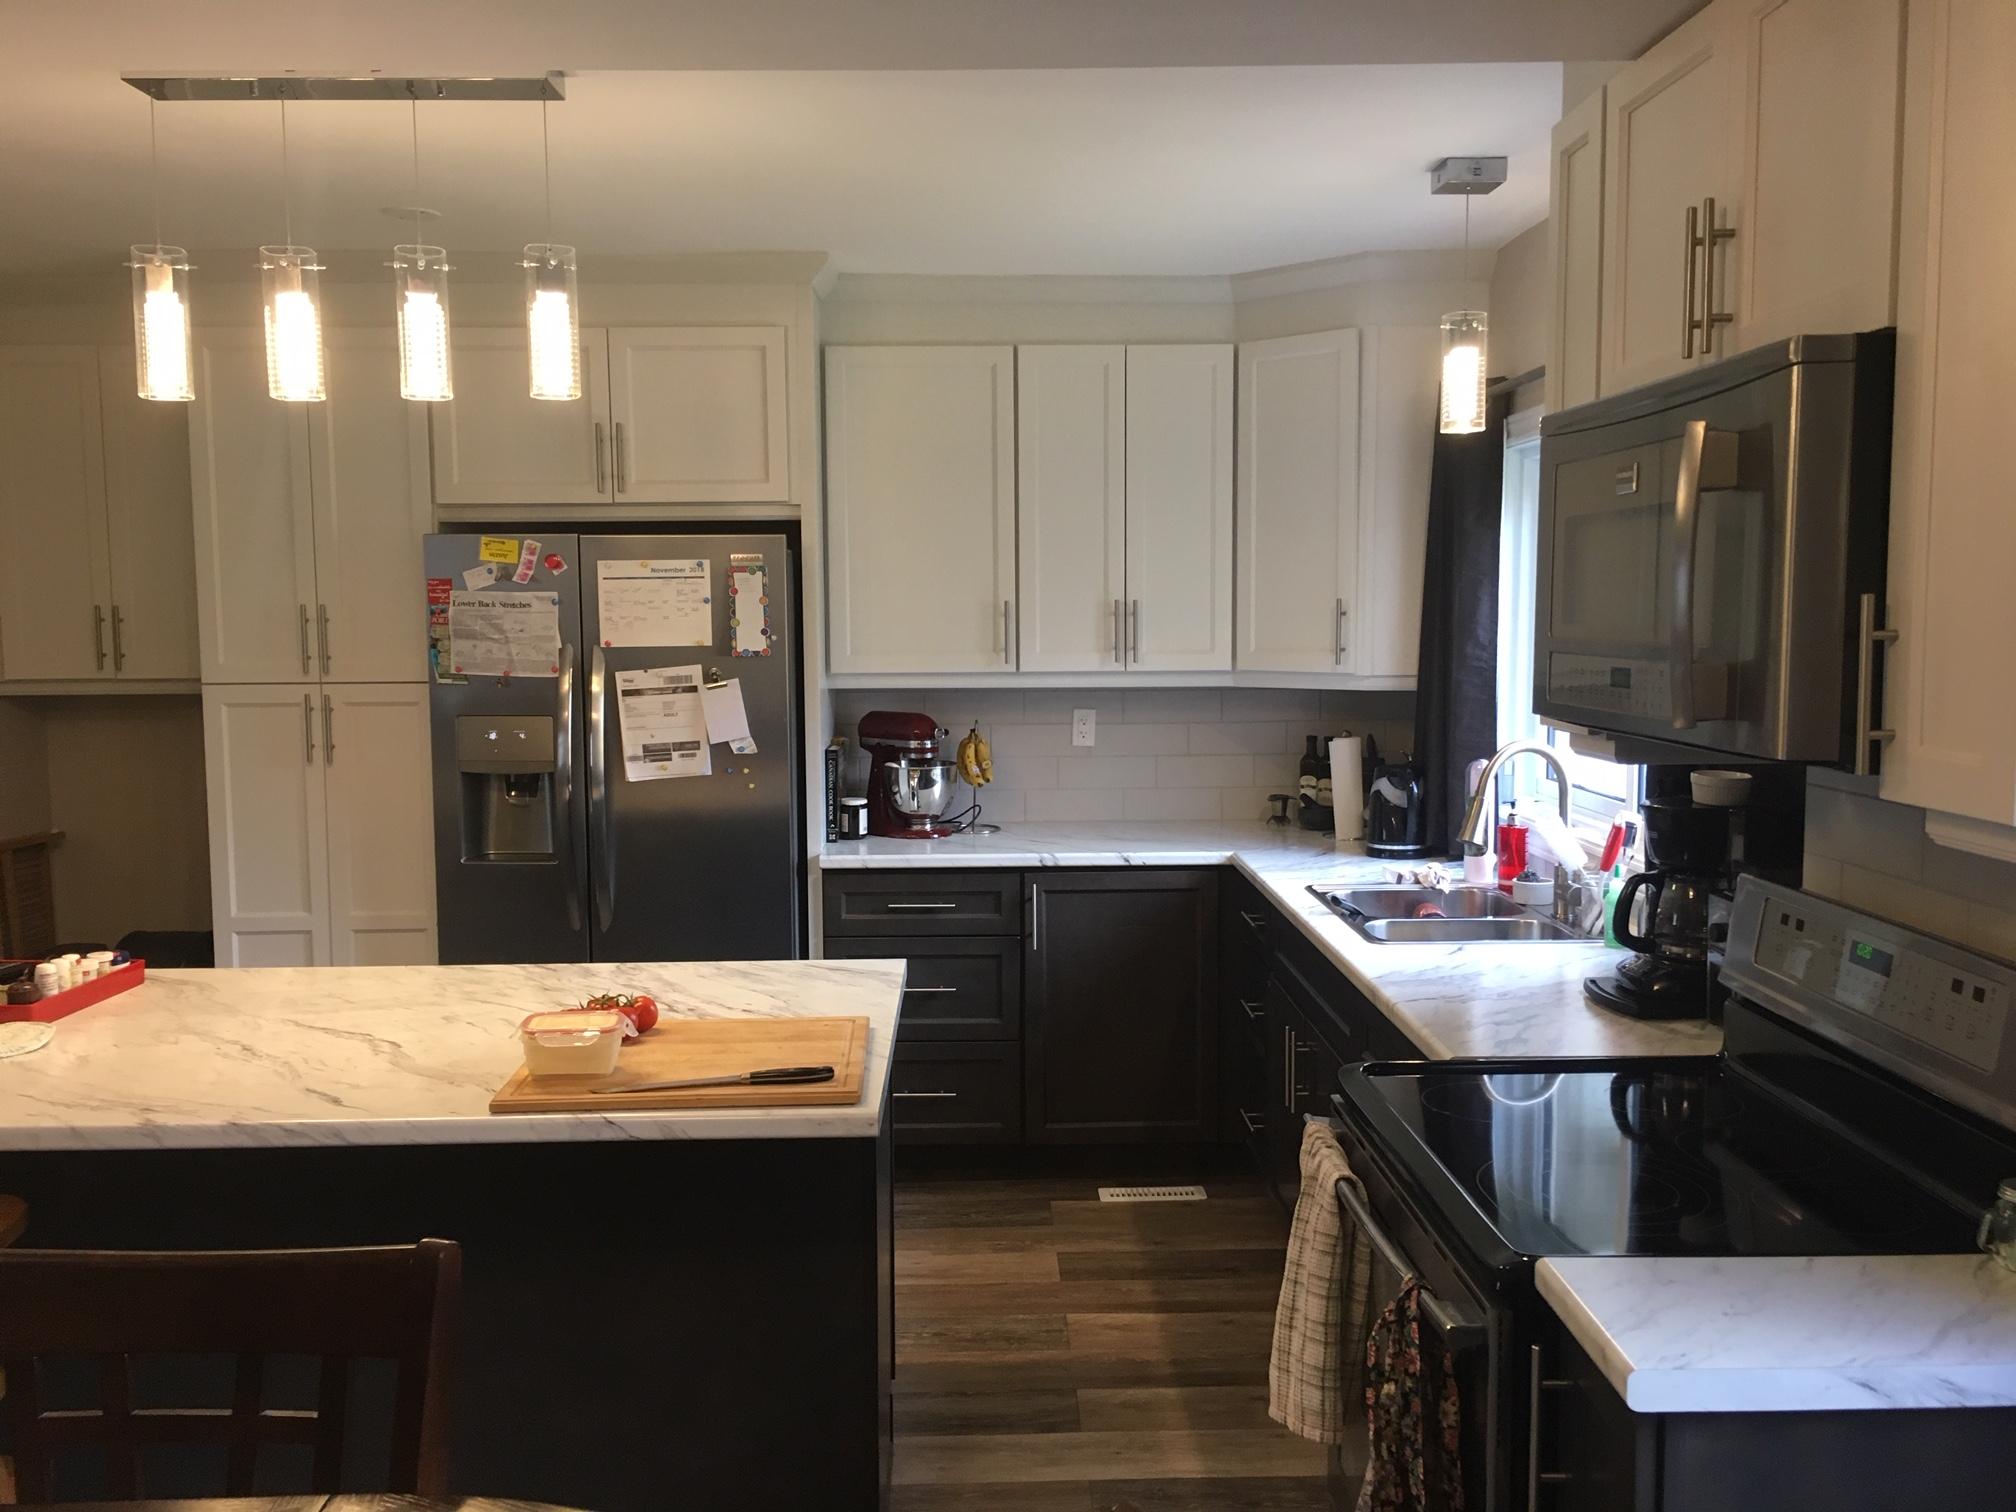 Kitchen Cabinets London6